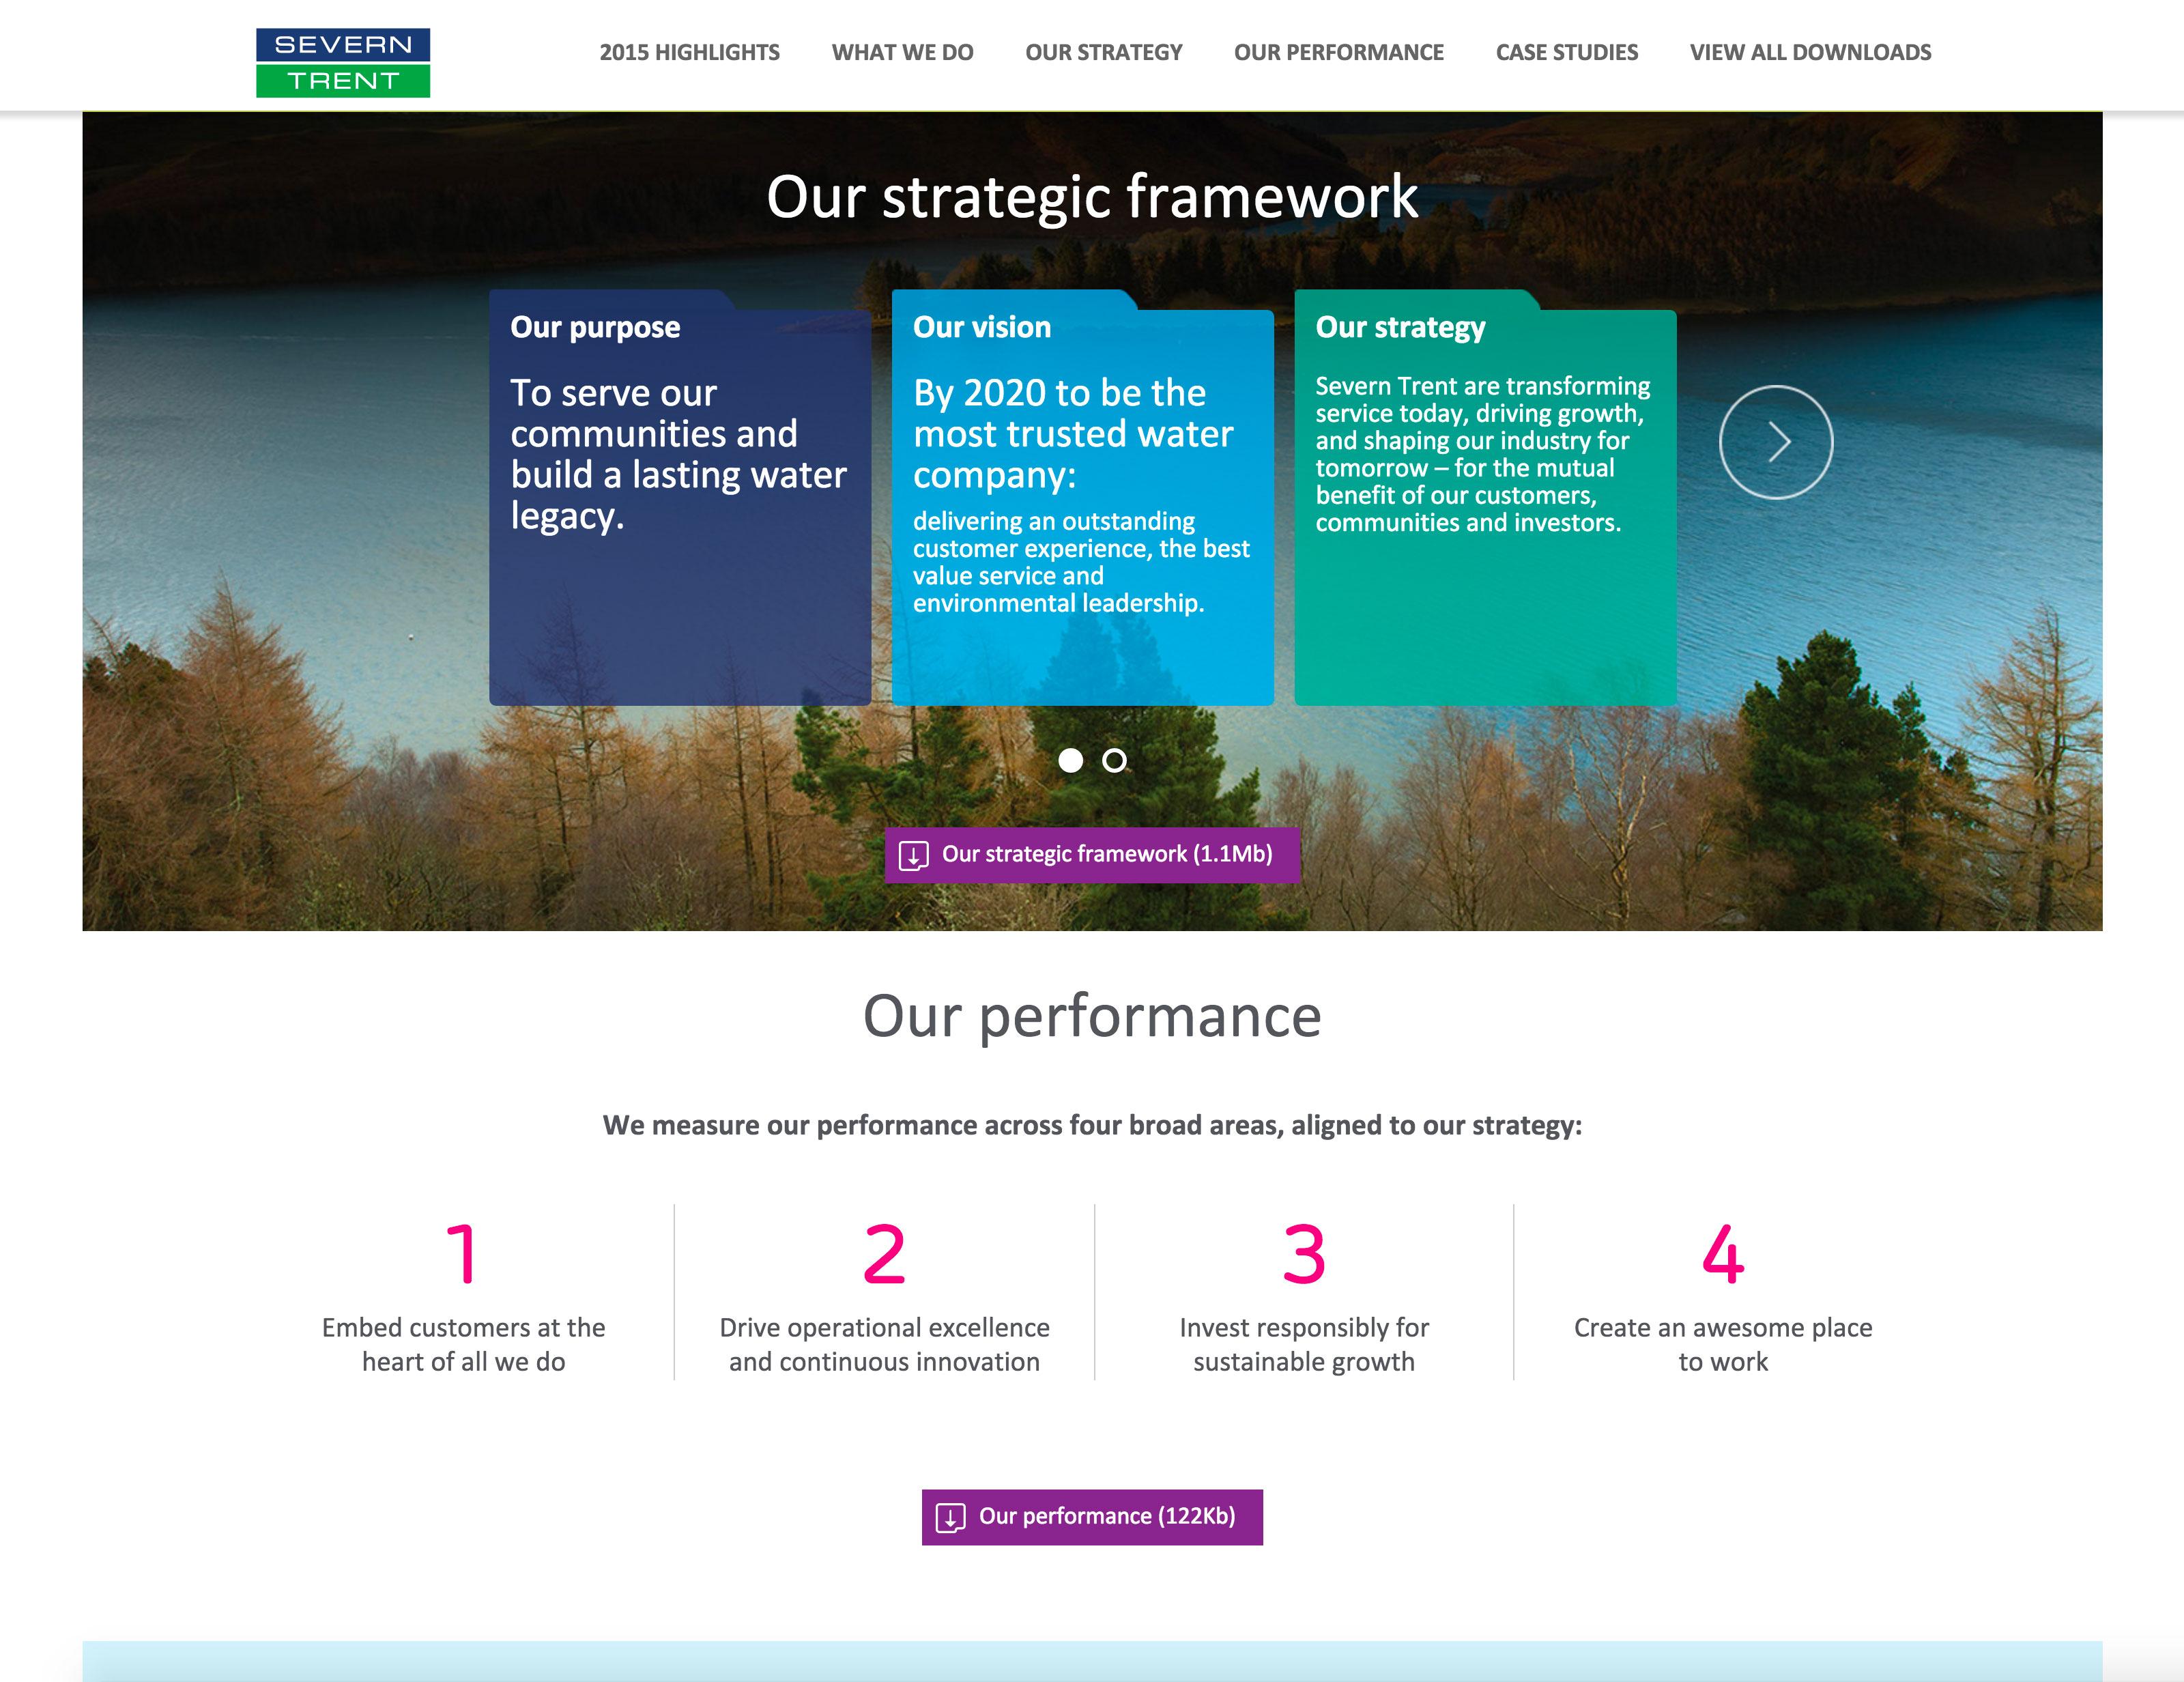 Screenshot of Severn Trent 2015 Annual Review strategic framework section on desktop